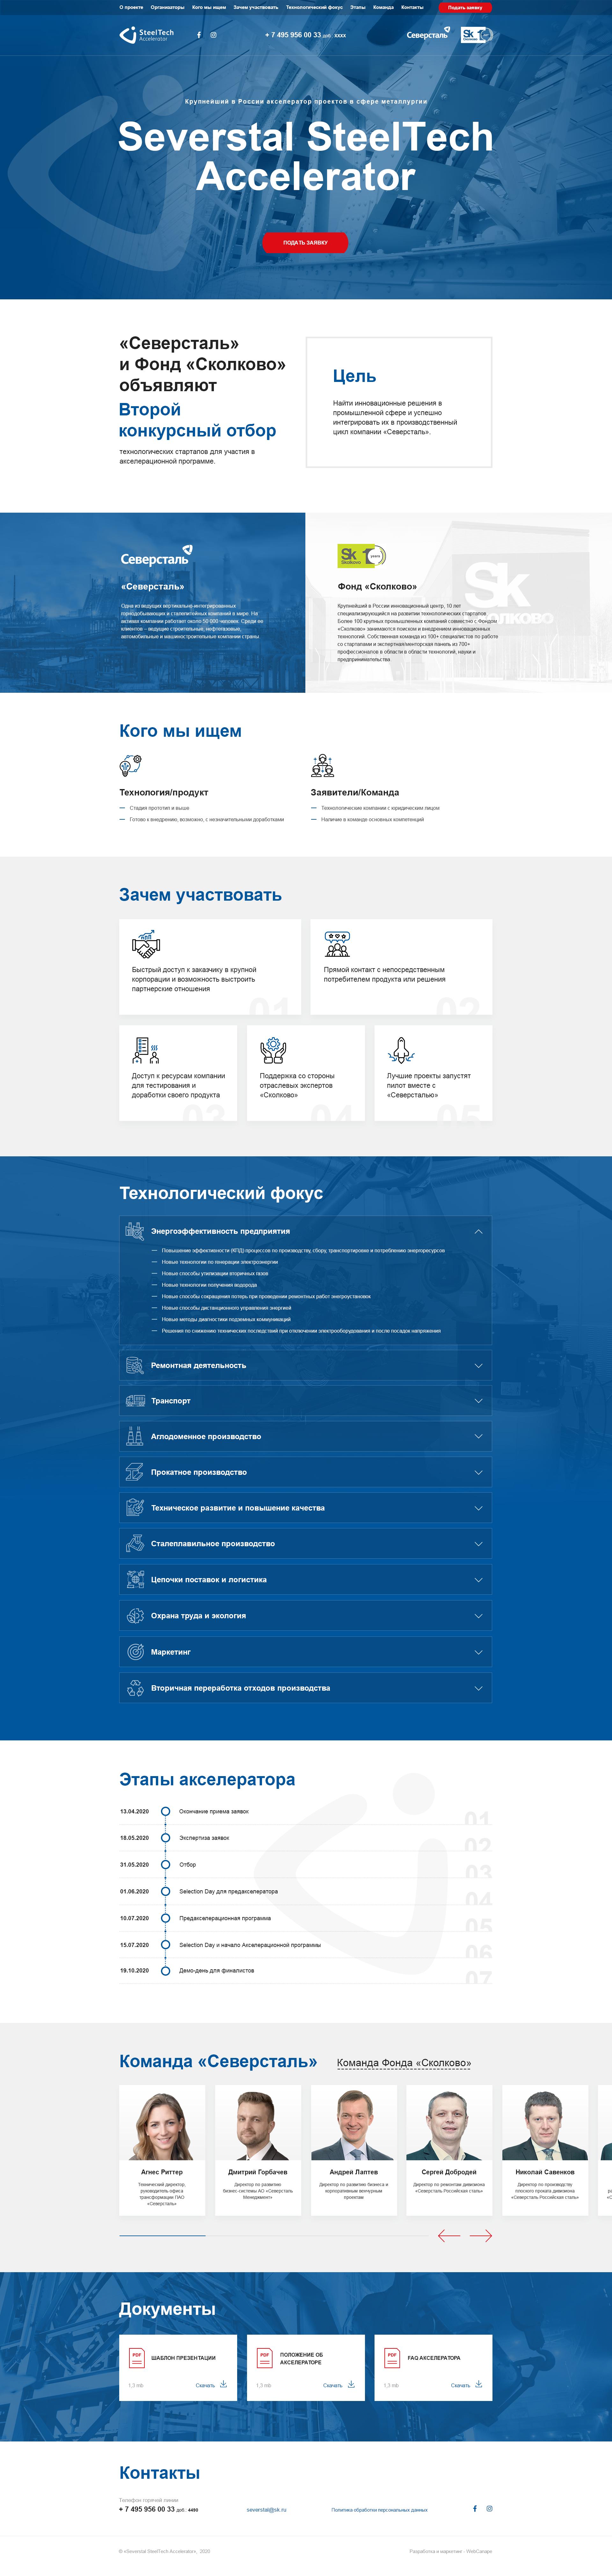 Severstal SteelTech Accelerator 2020